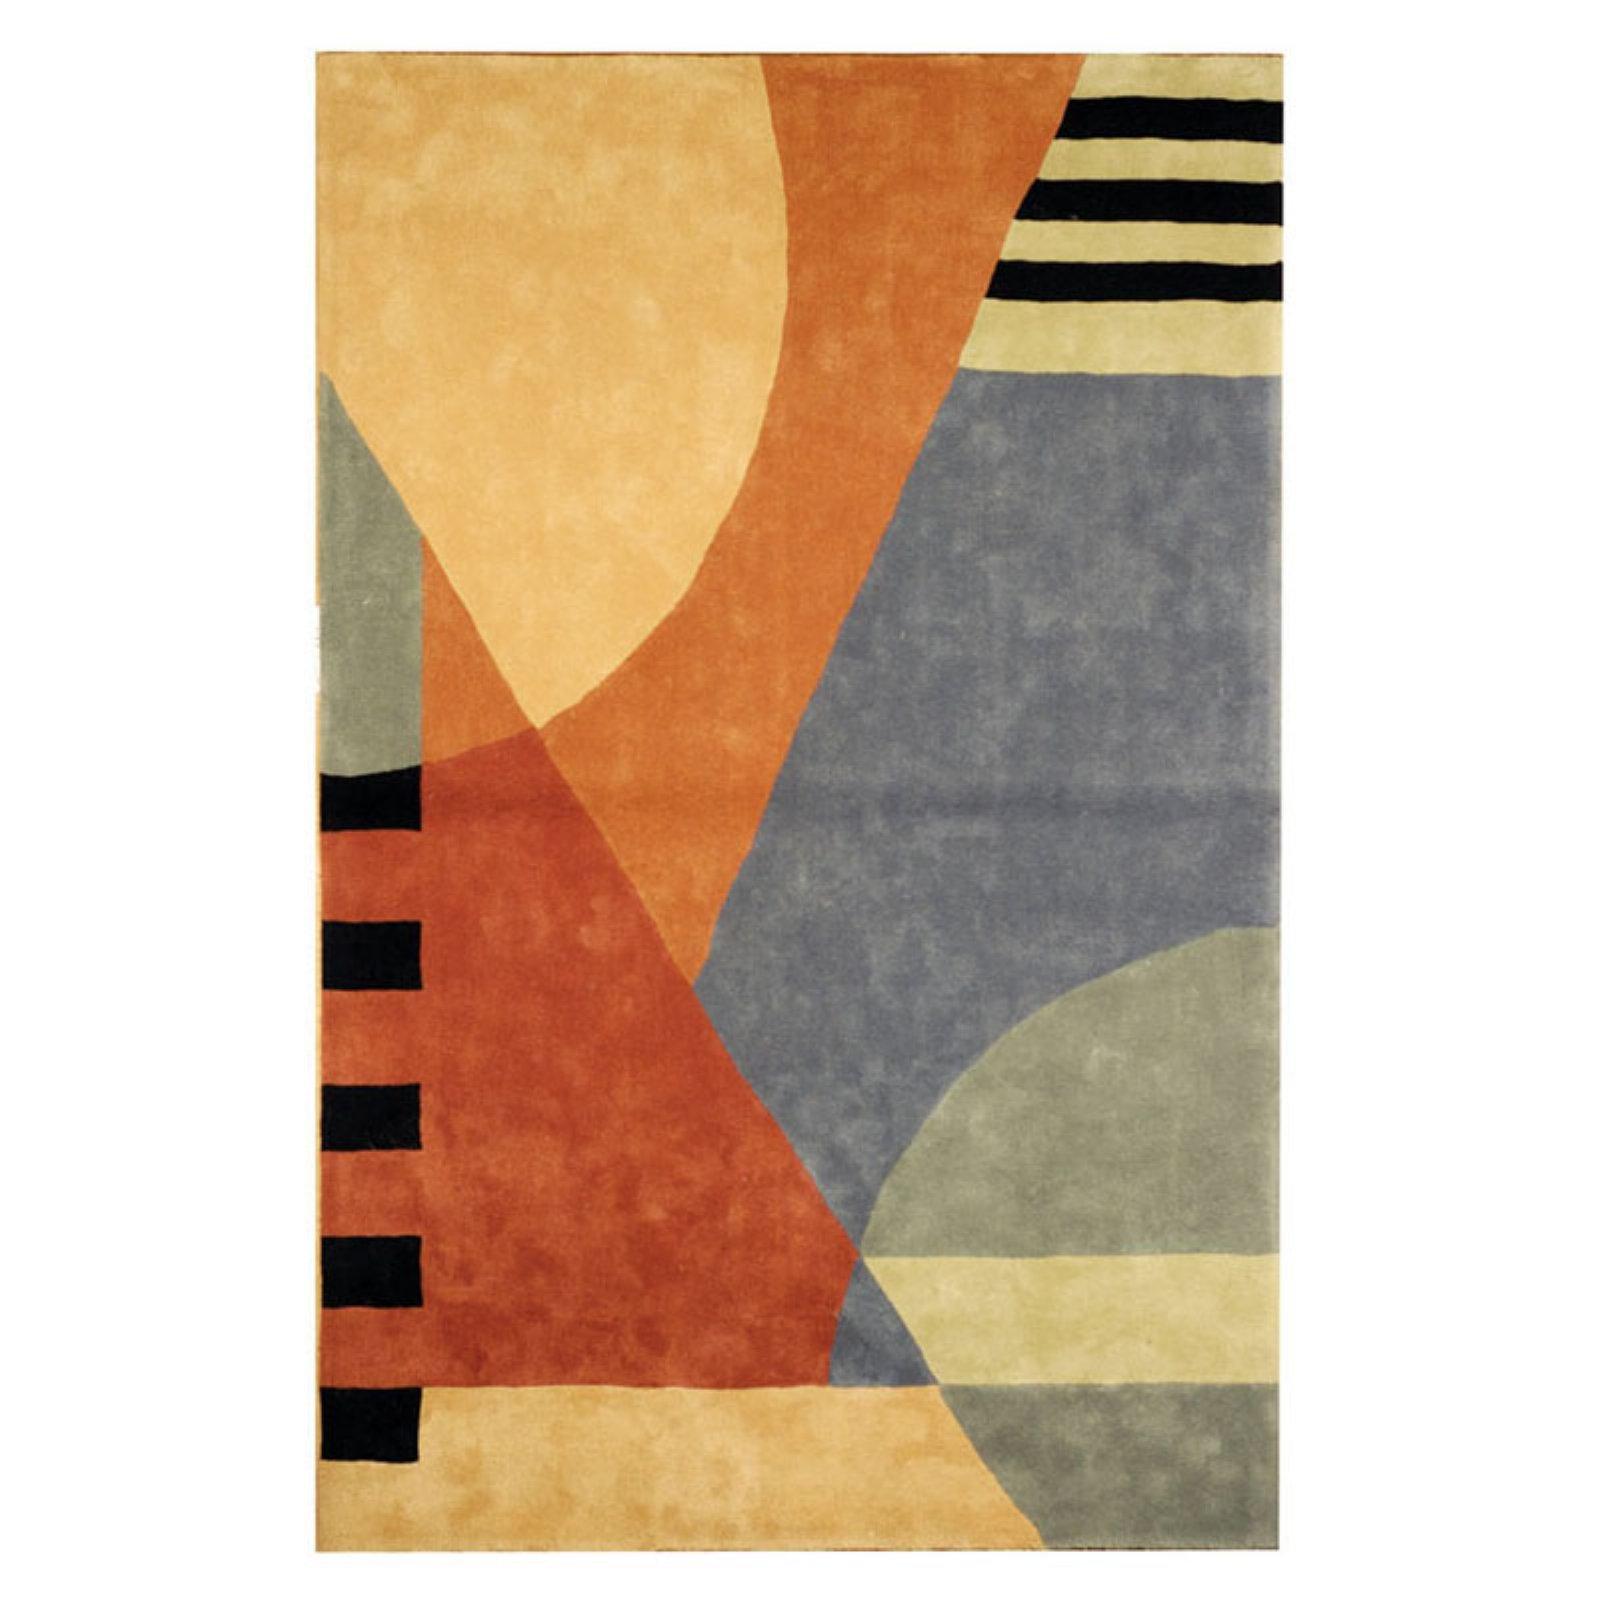 Safavieh Rodeo Drive Marsan Hand-Tufted Wool Area Rug, Gold